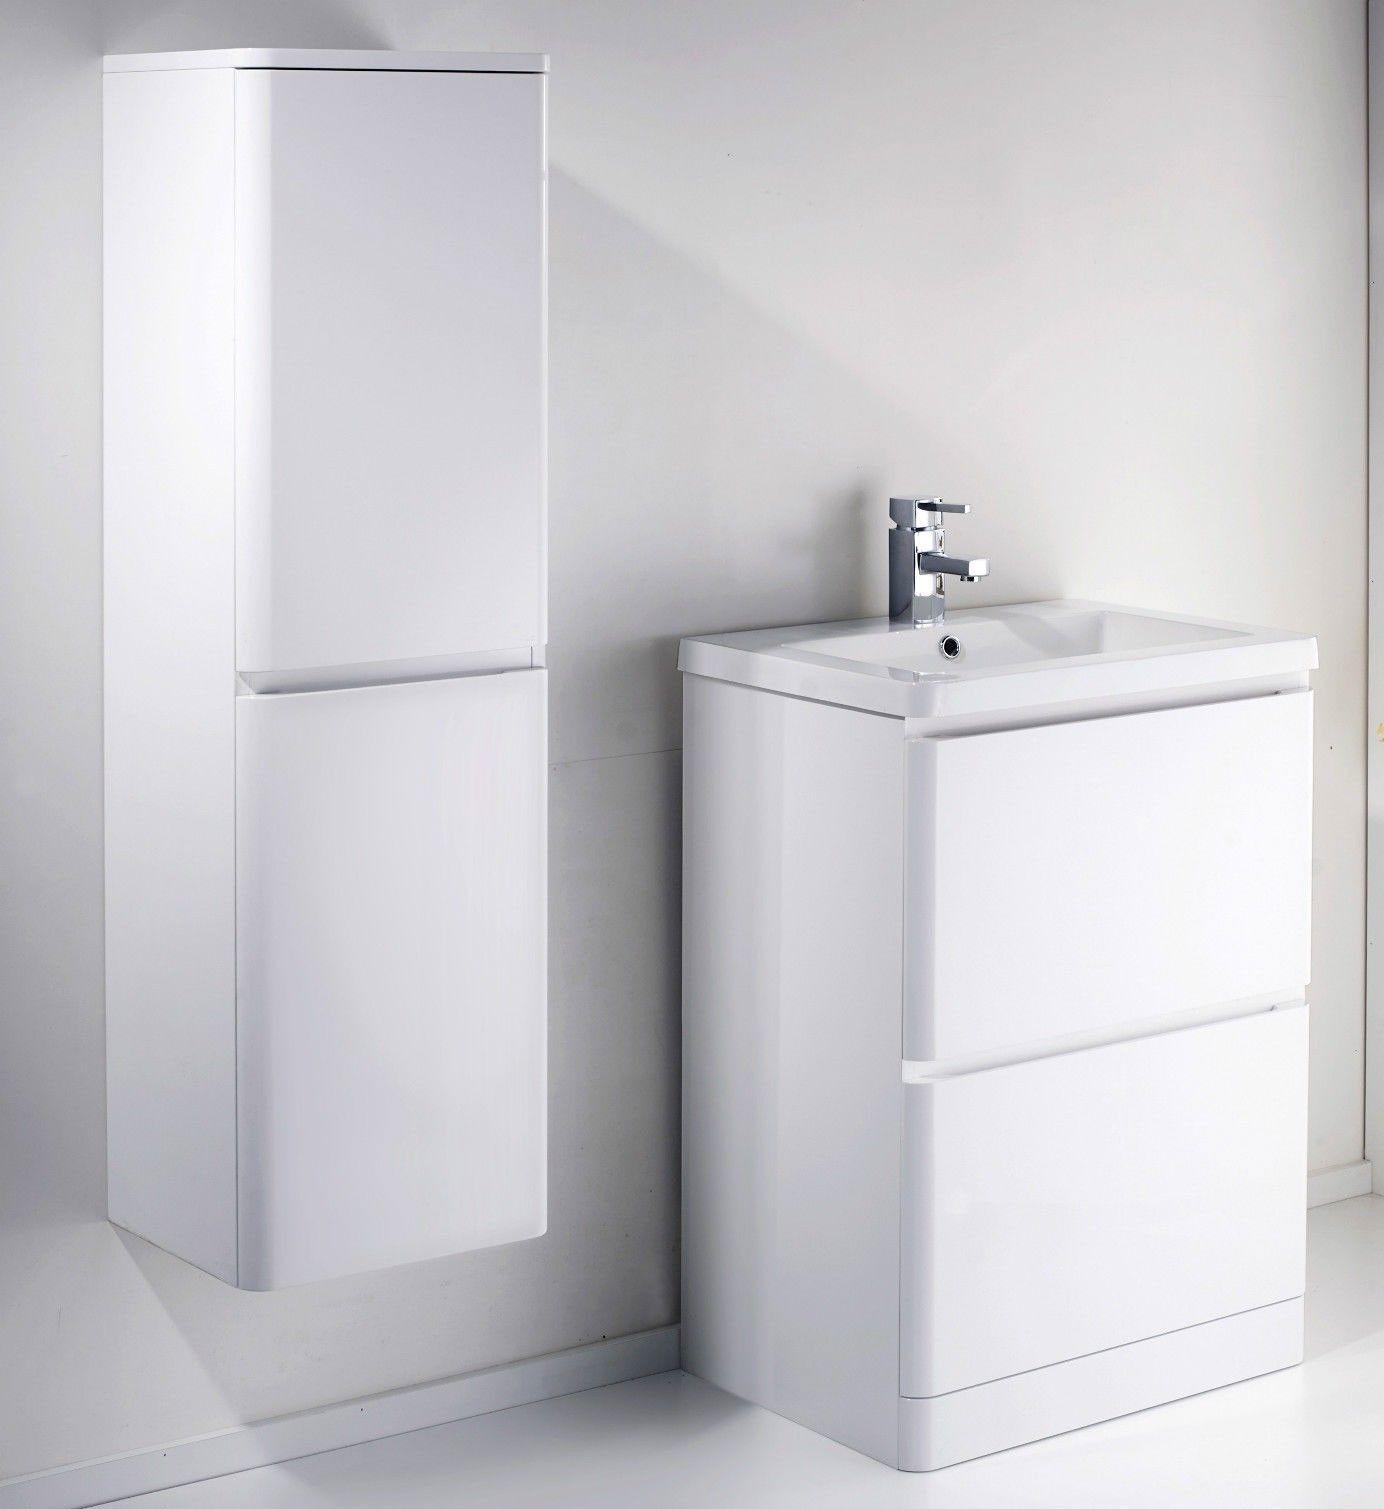 Alaska 600mm Freestanding White Gloss Basin Vanity Unit Side Cabinet Bathroom Cabinets Bathroom Trends Cabinet